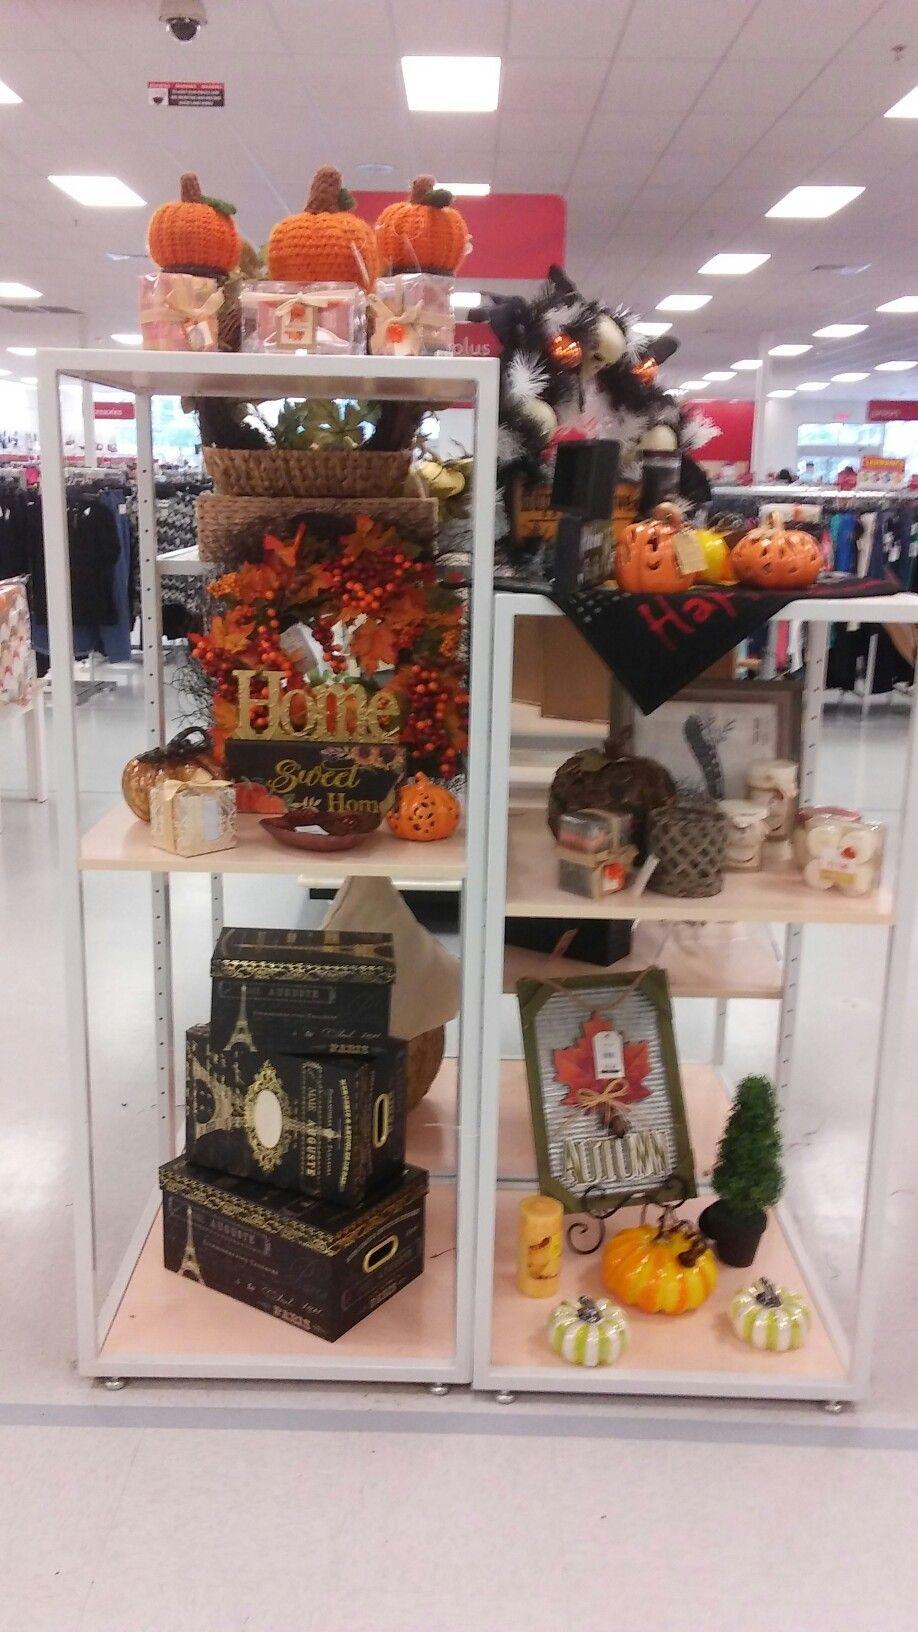 Burkes outlet creative hobbies store displays baby